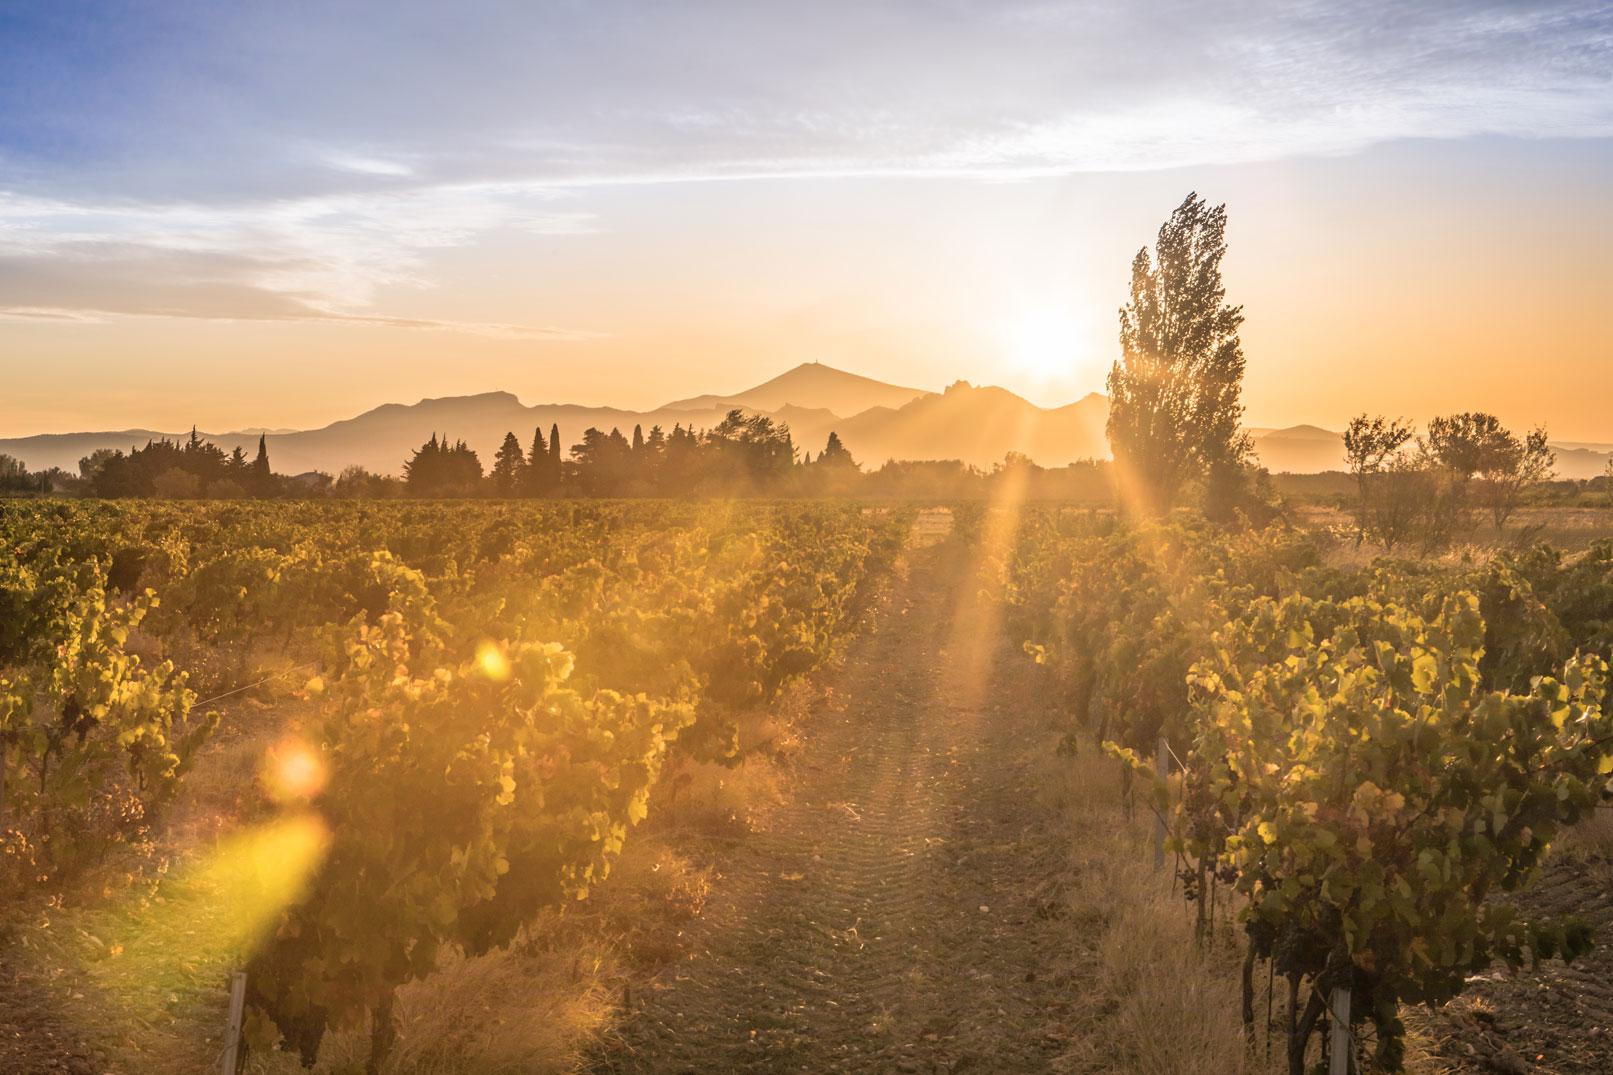 vineyards © Kessler